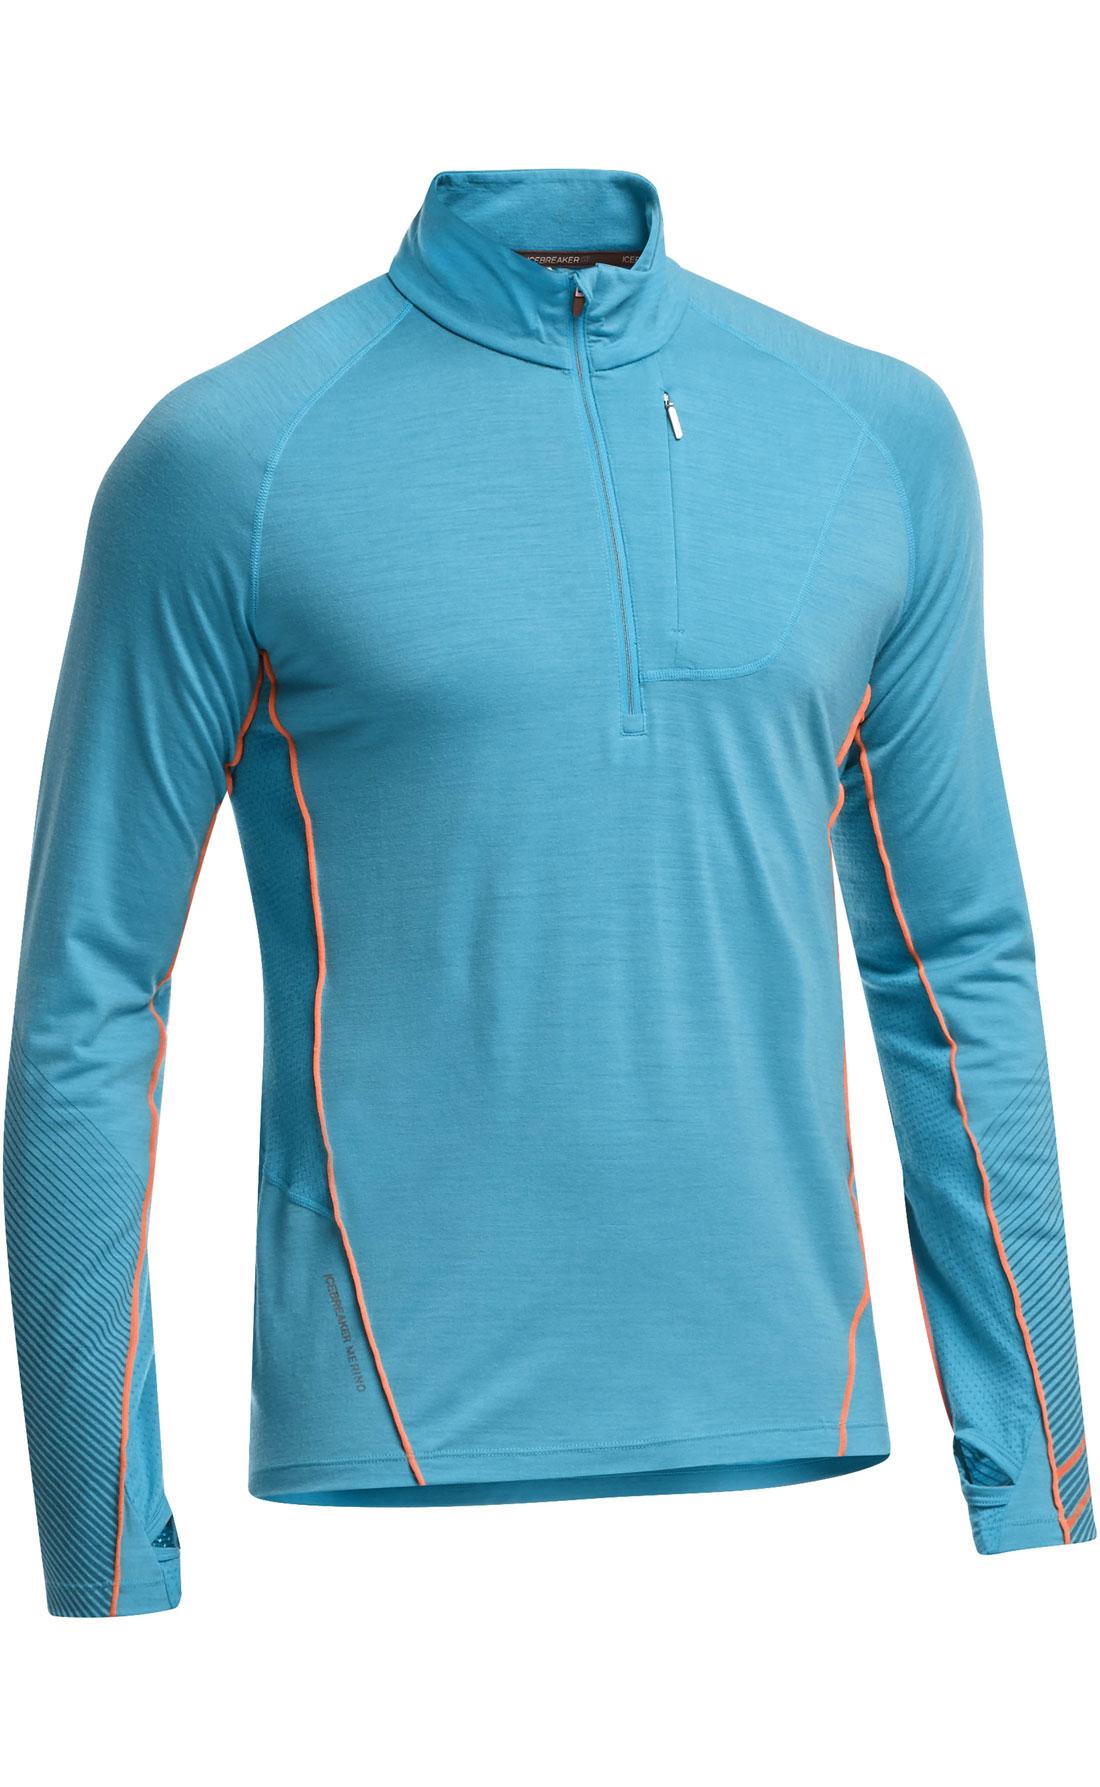 Le tee-shirt en laine mérinos Icebreaker Drive Long Sleeve Half Zip.